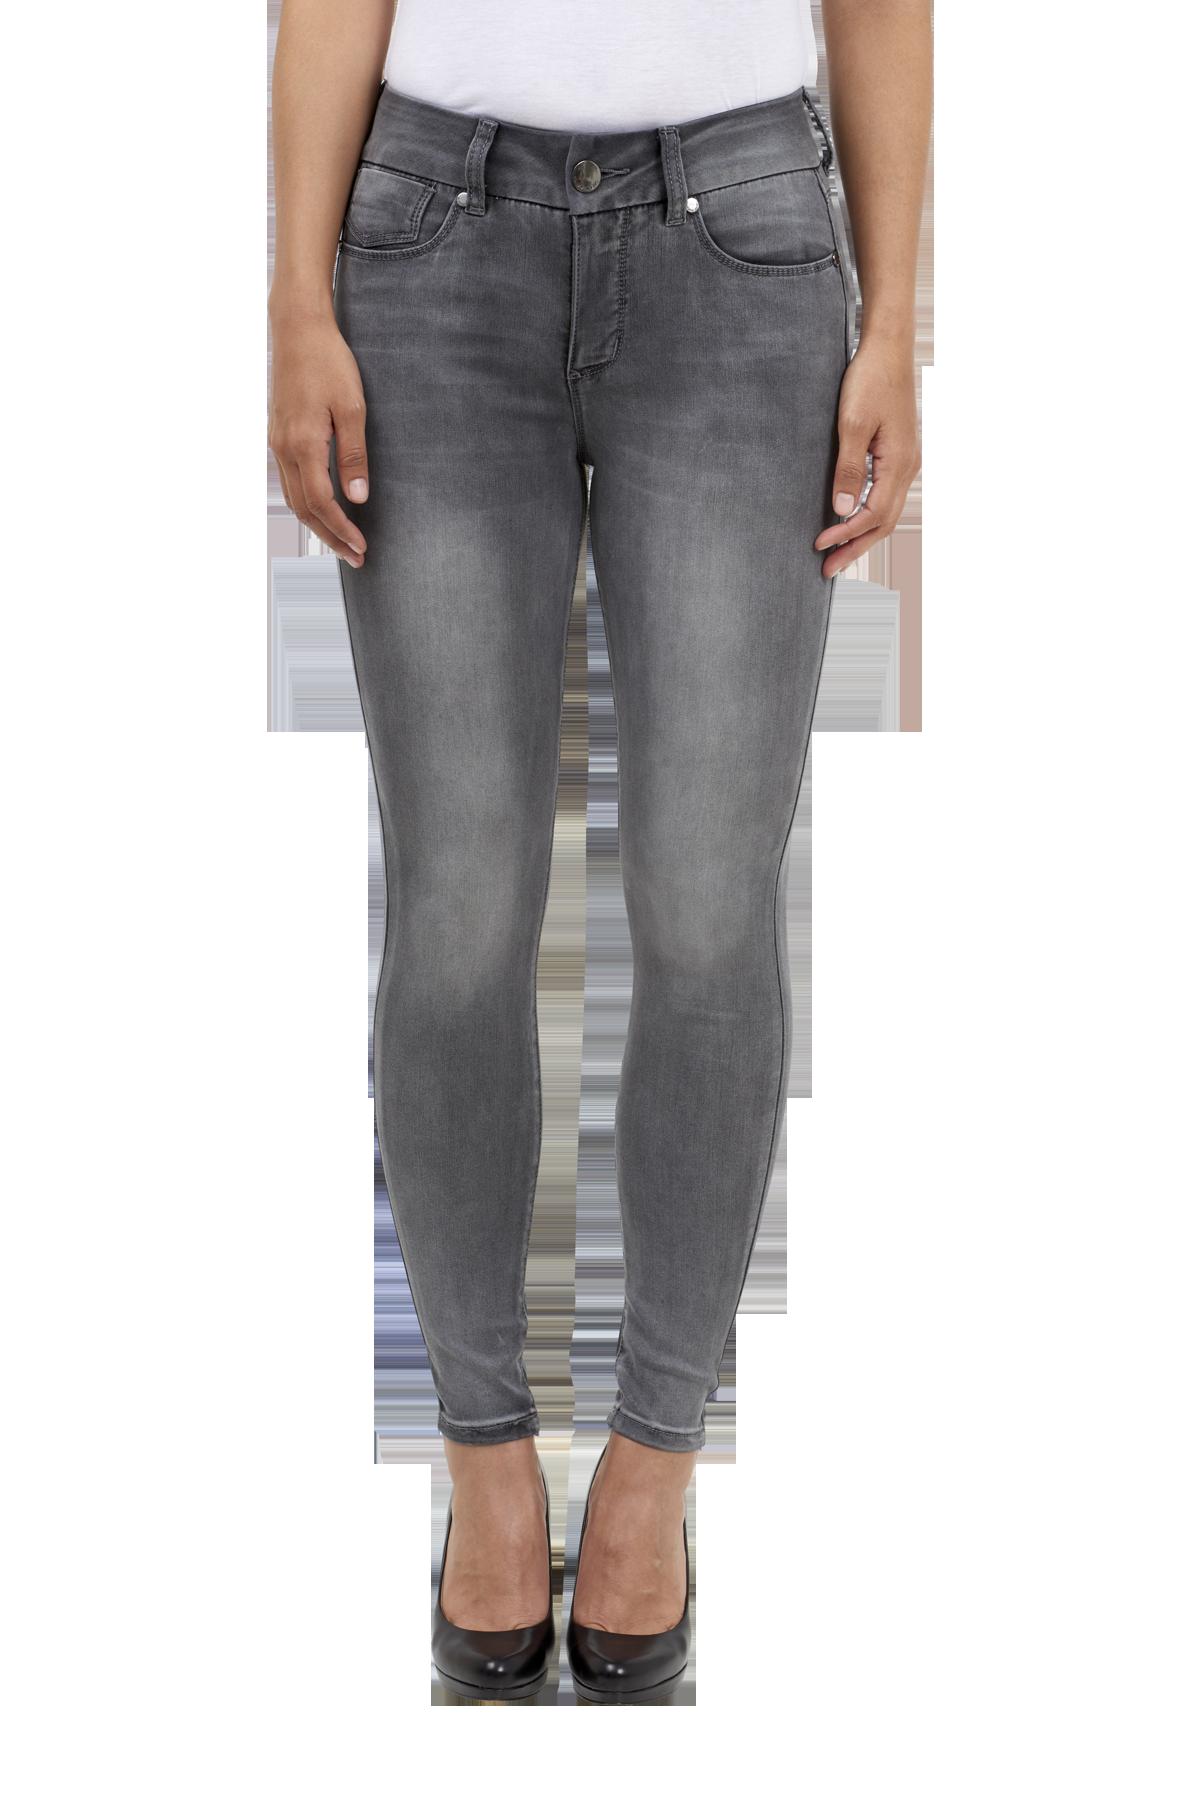 Seven7 Jeans Tummyless Legging